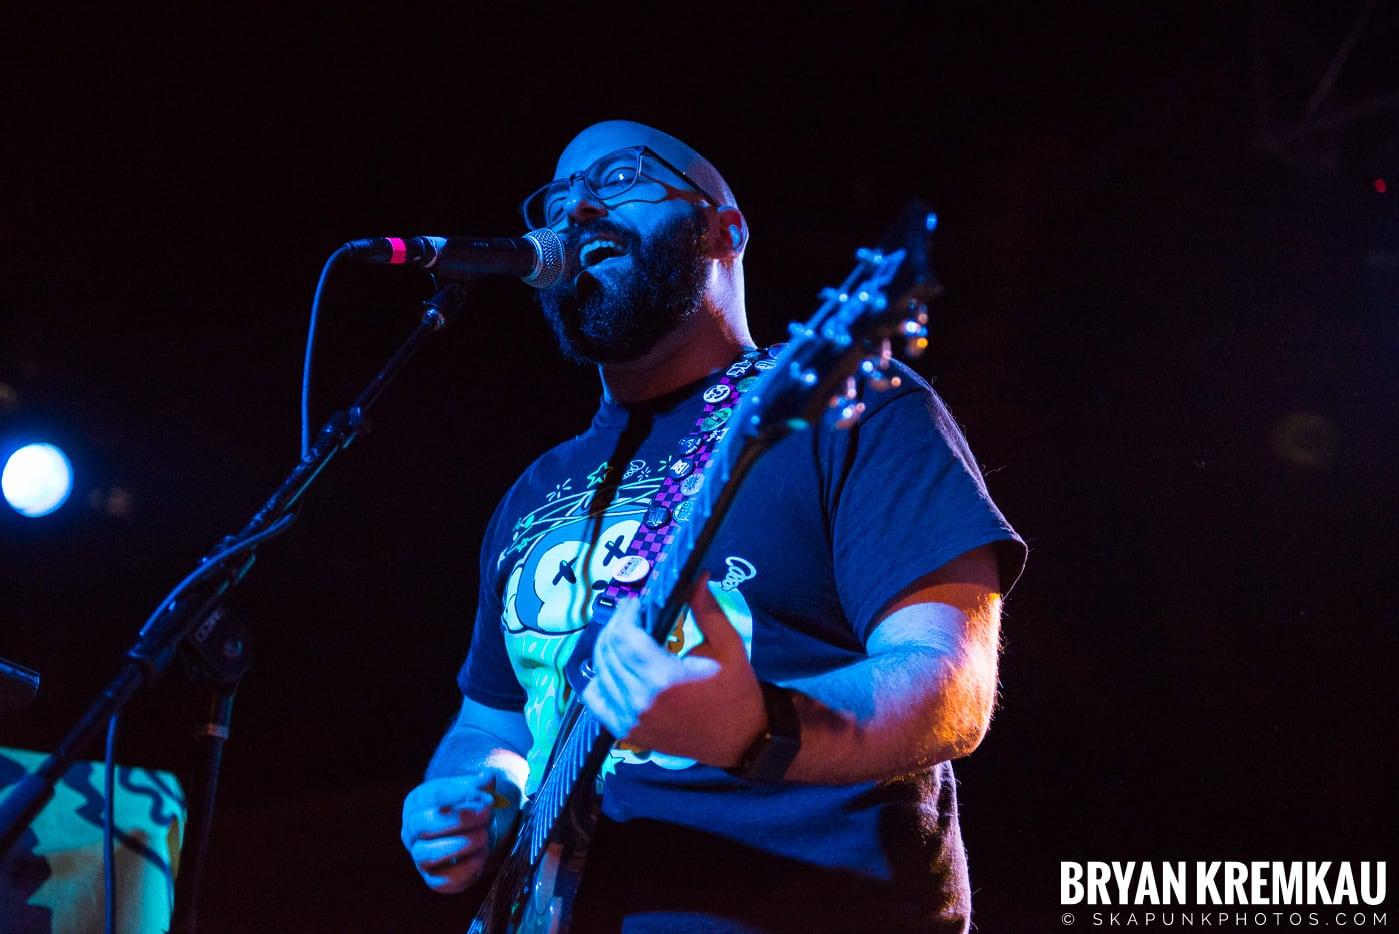 Backyard Superheroes @ Starland Ballroom, Sayreville, NJ - 11.23.18 (40)